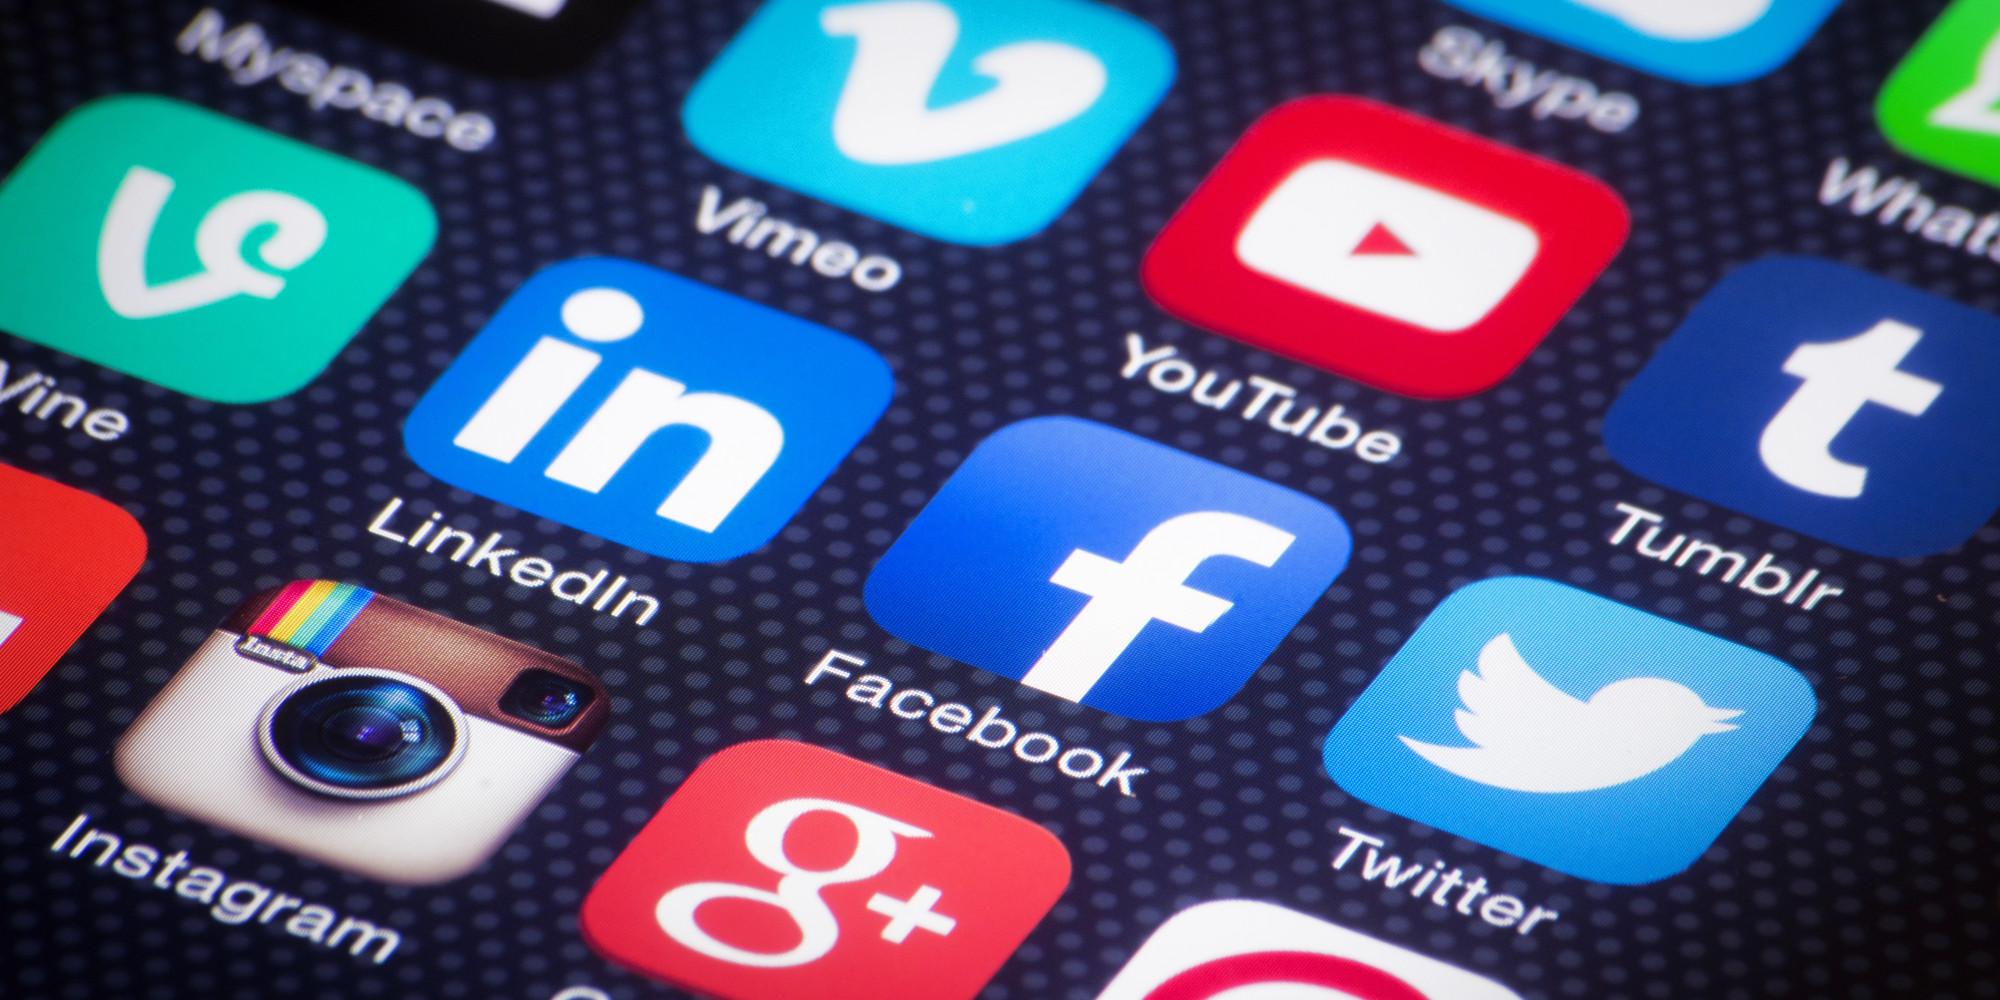 Social media apps on a screen.